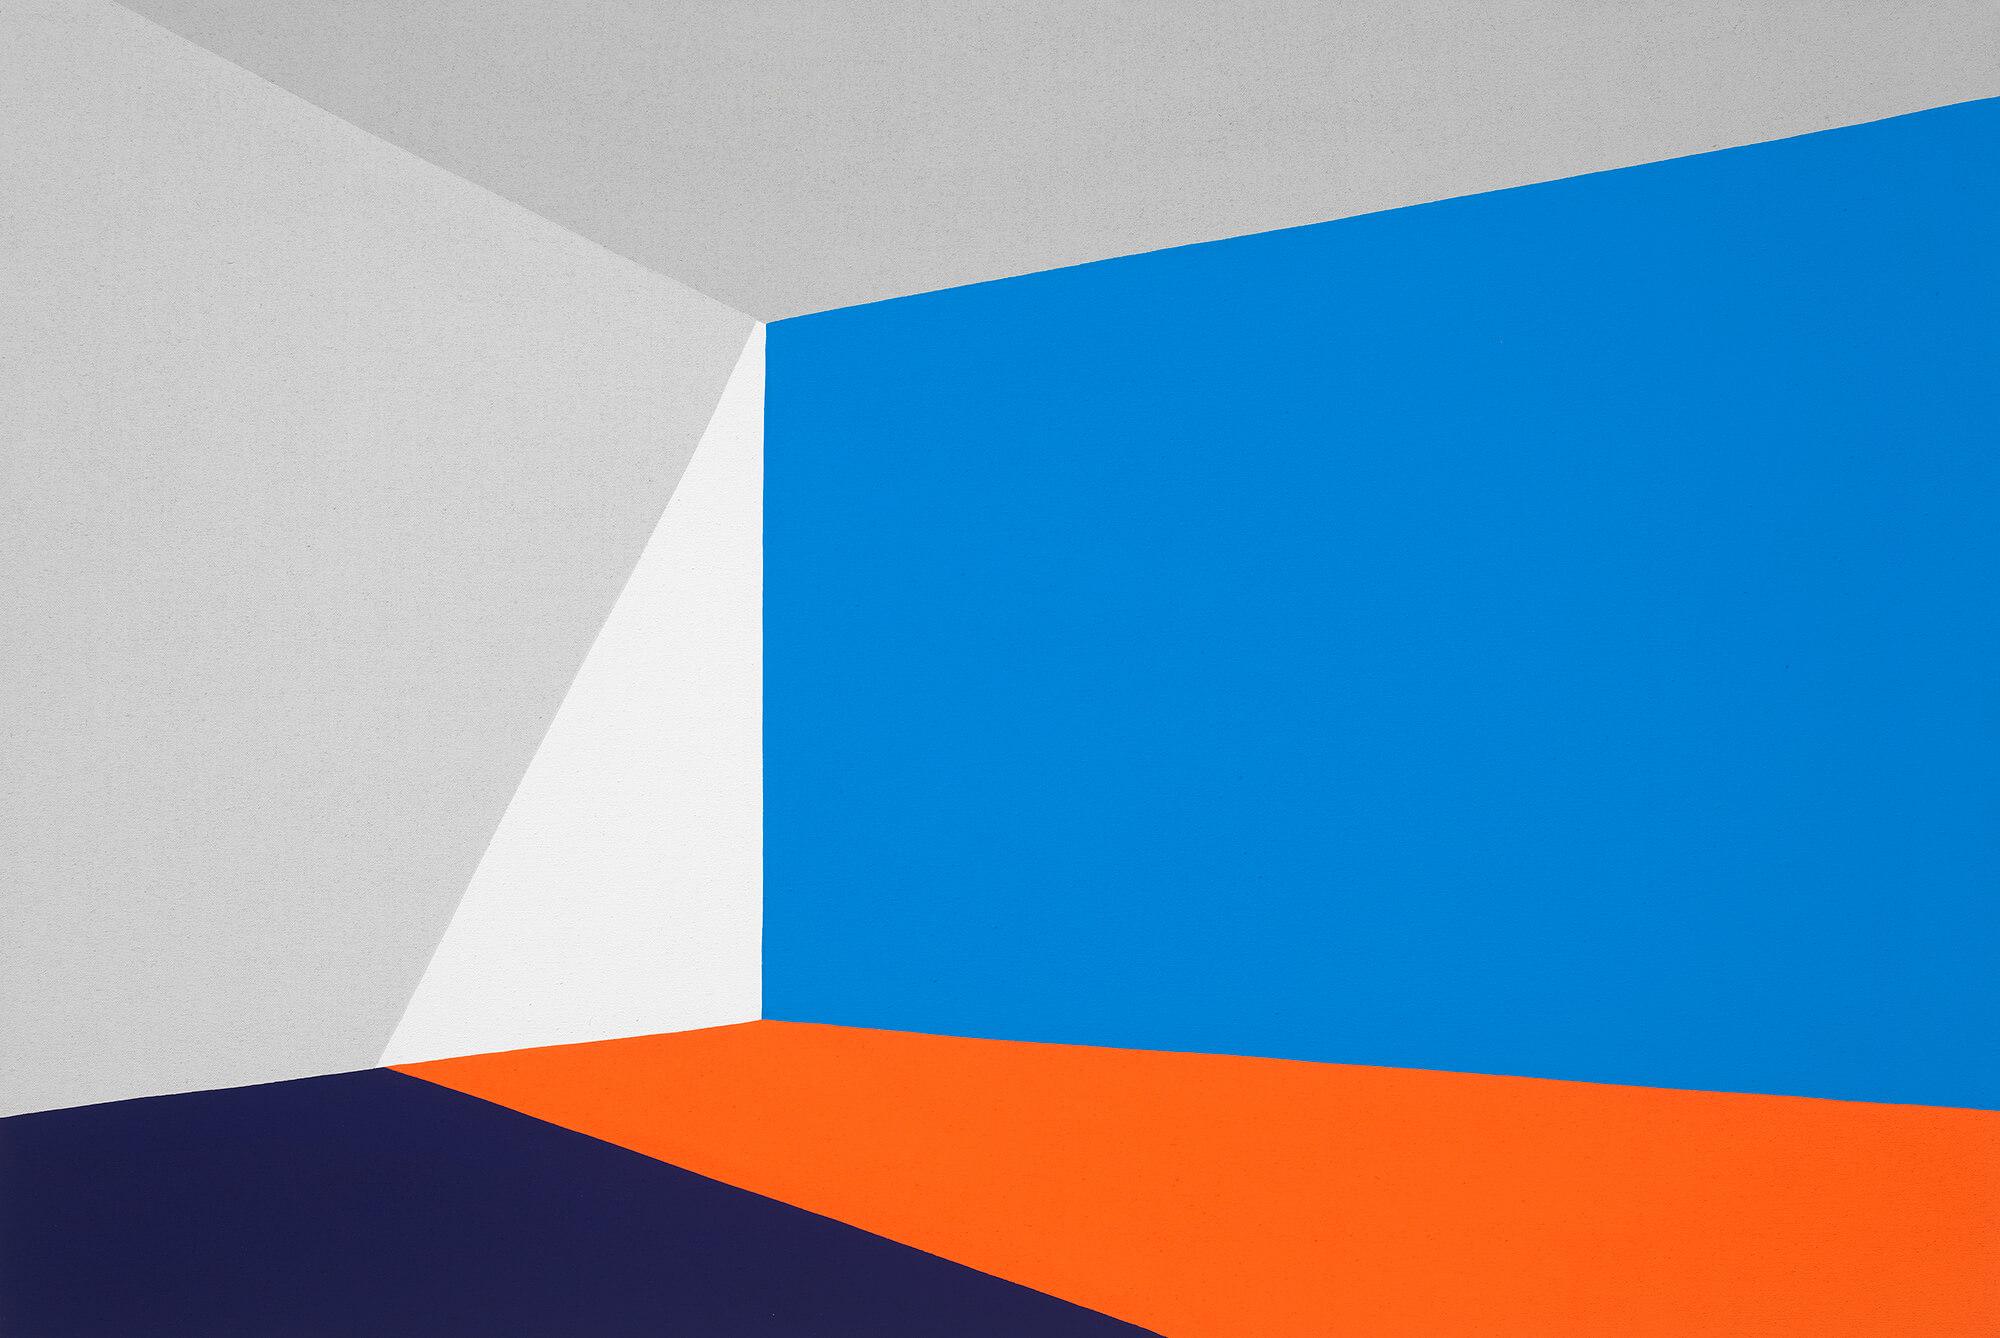 Paul Kremer Opening 06, 2021 acrylic on canvas 40 x 60 in. (101.6 x 152.4 cm.)